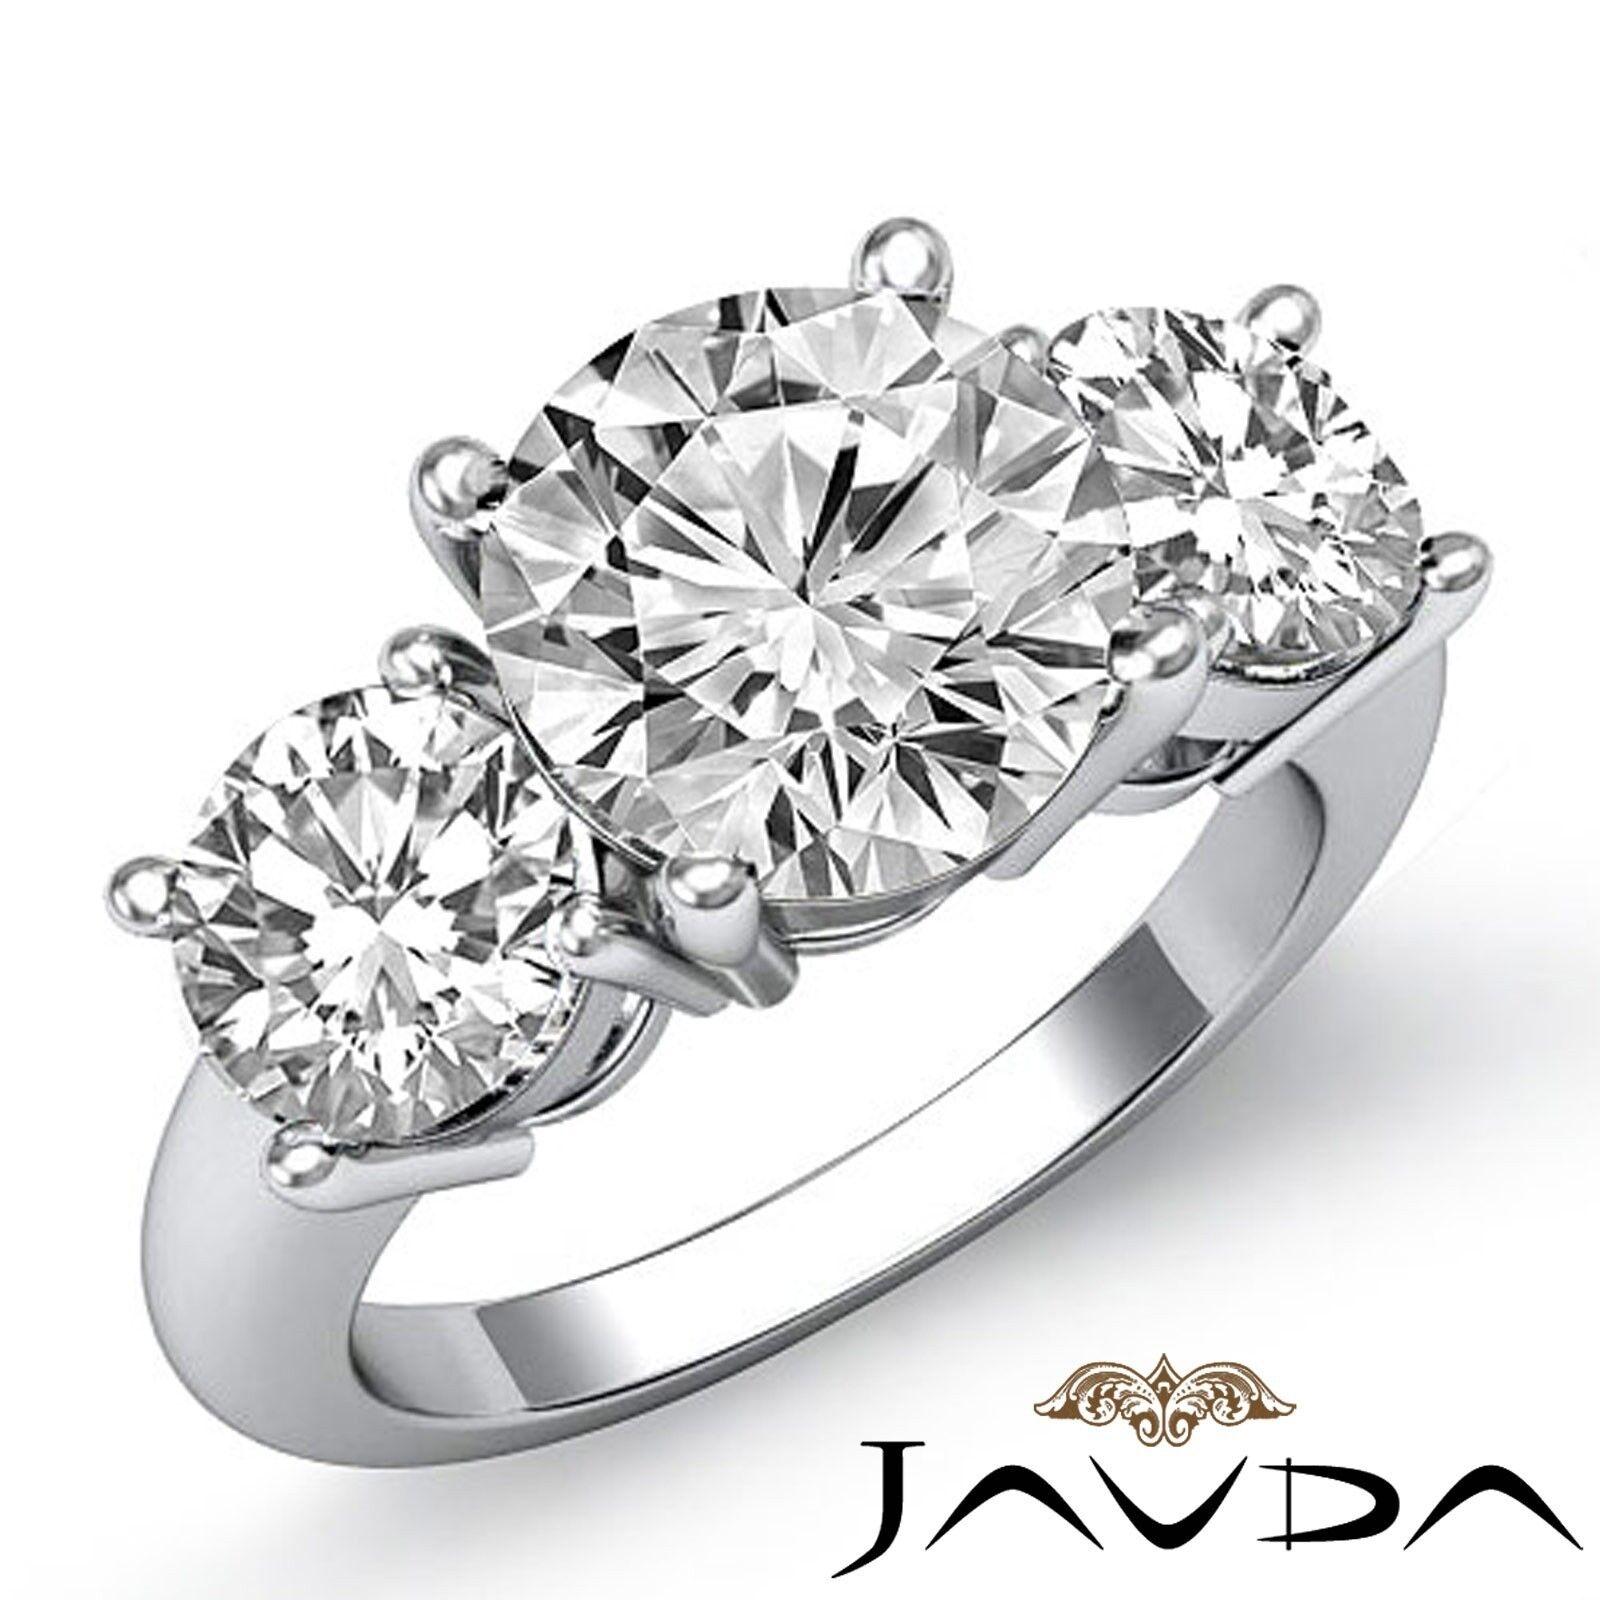 3.1ctw Three Stone Prong Setting Round Diamond Engagement Ring GIA F-SI1 W Gold